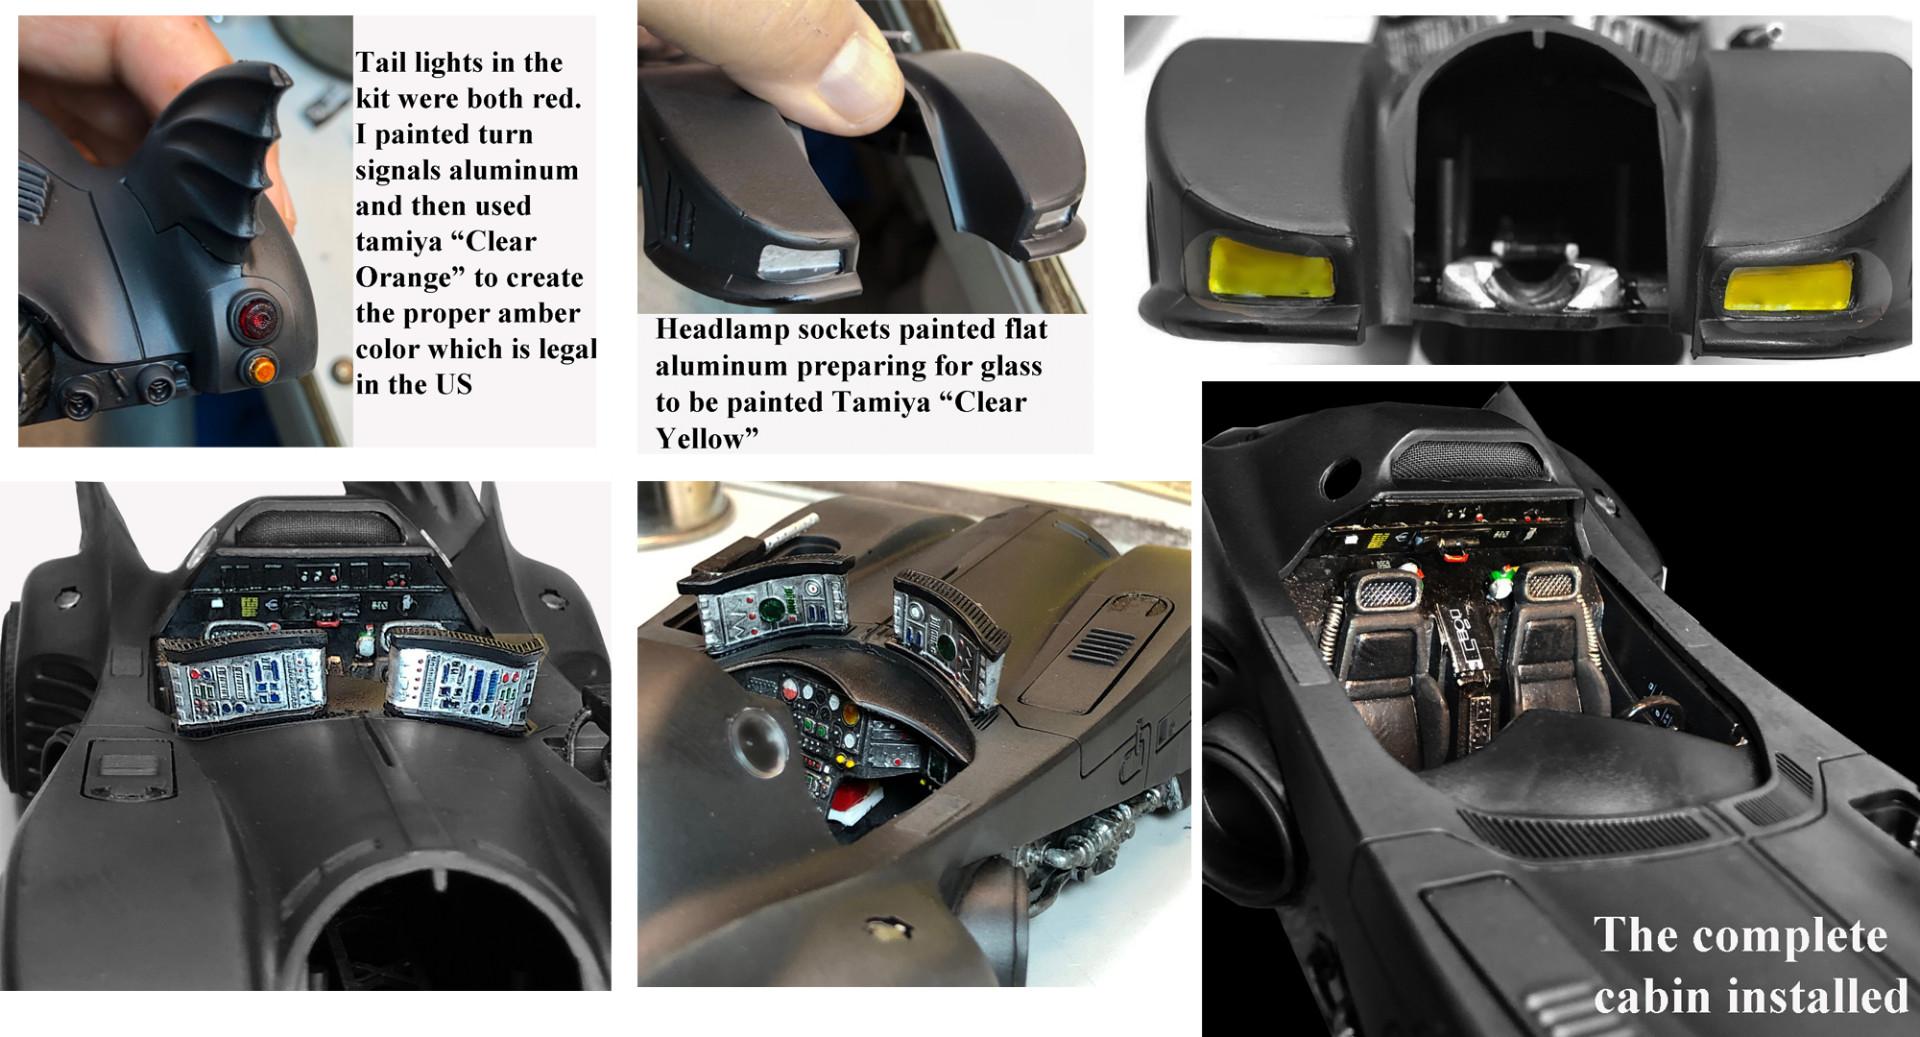 Batmobile details VII   08  03  2019.jpg